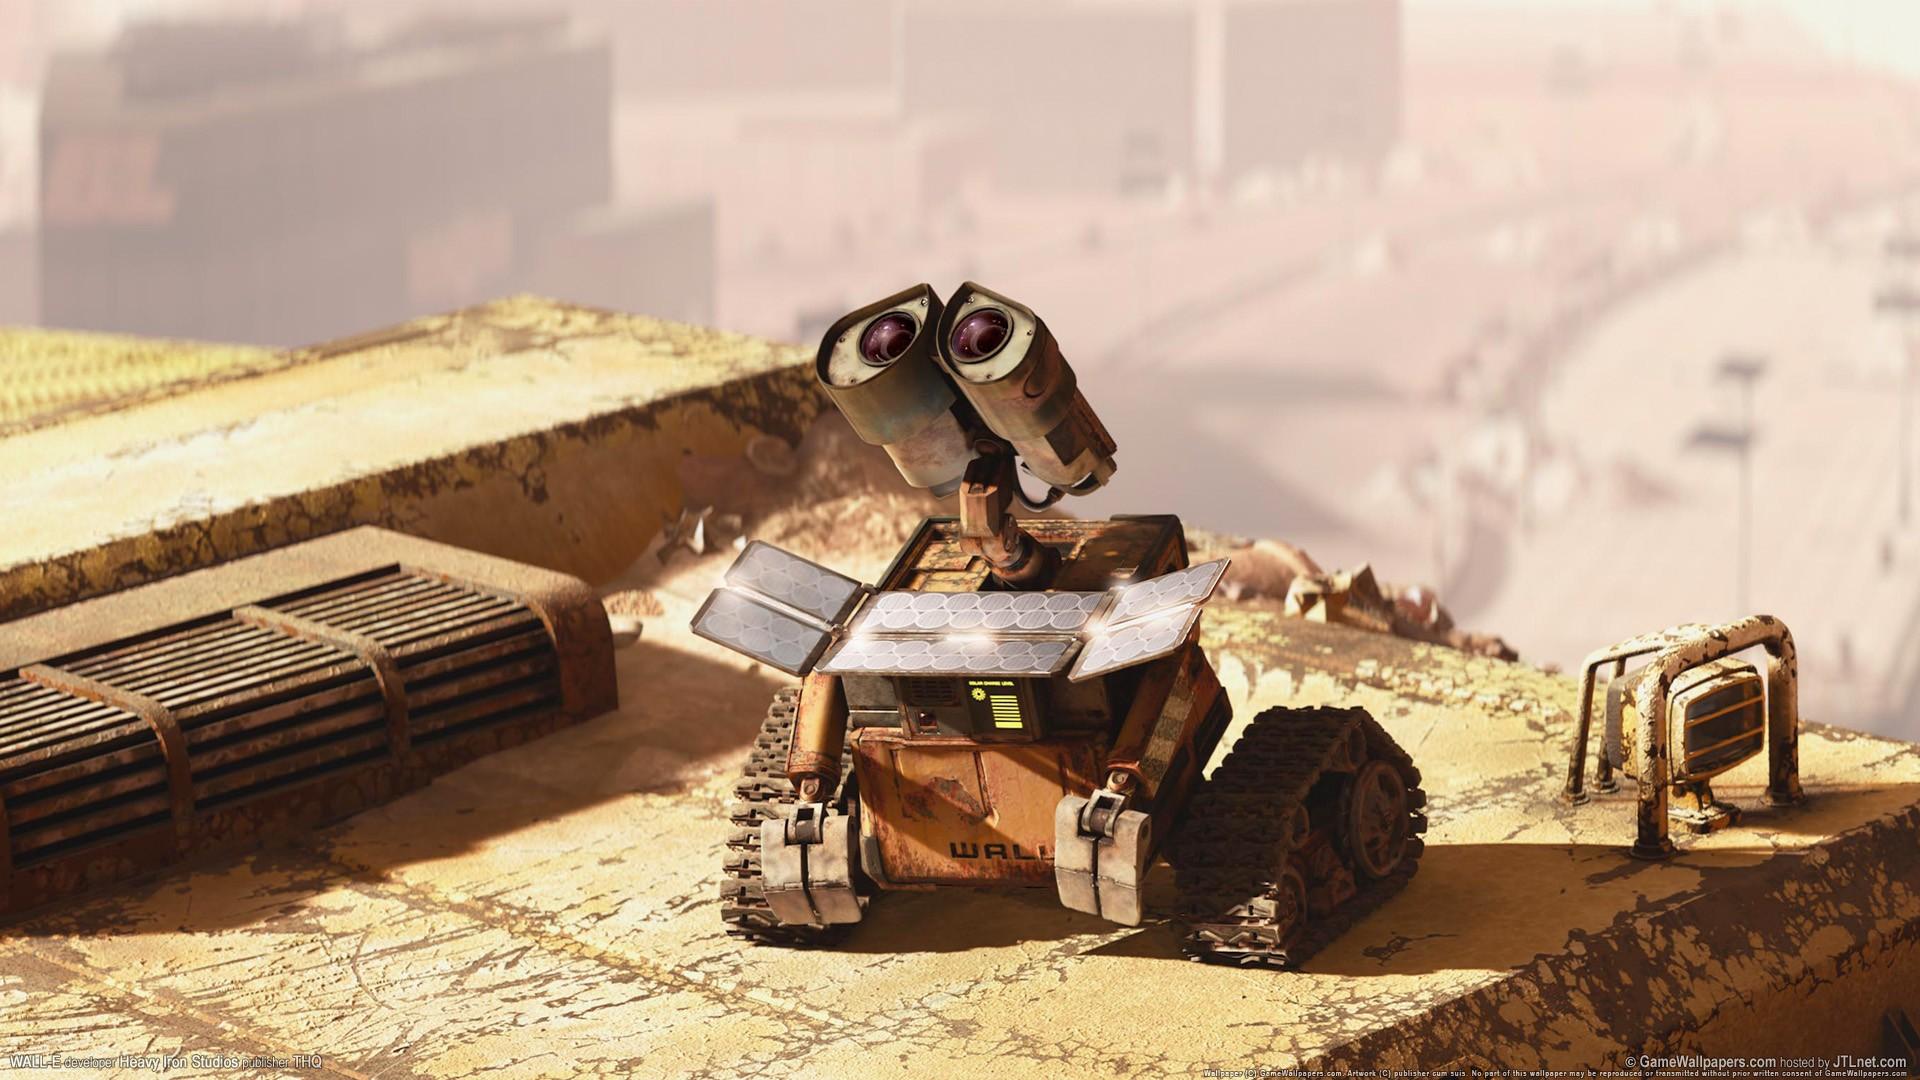 General 1920x1080 movies Disney Pixar WALL·E animated movies Pixar Animation Studios